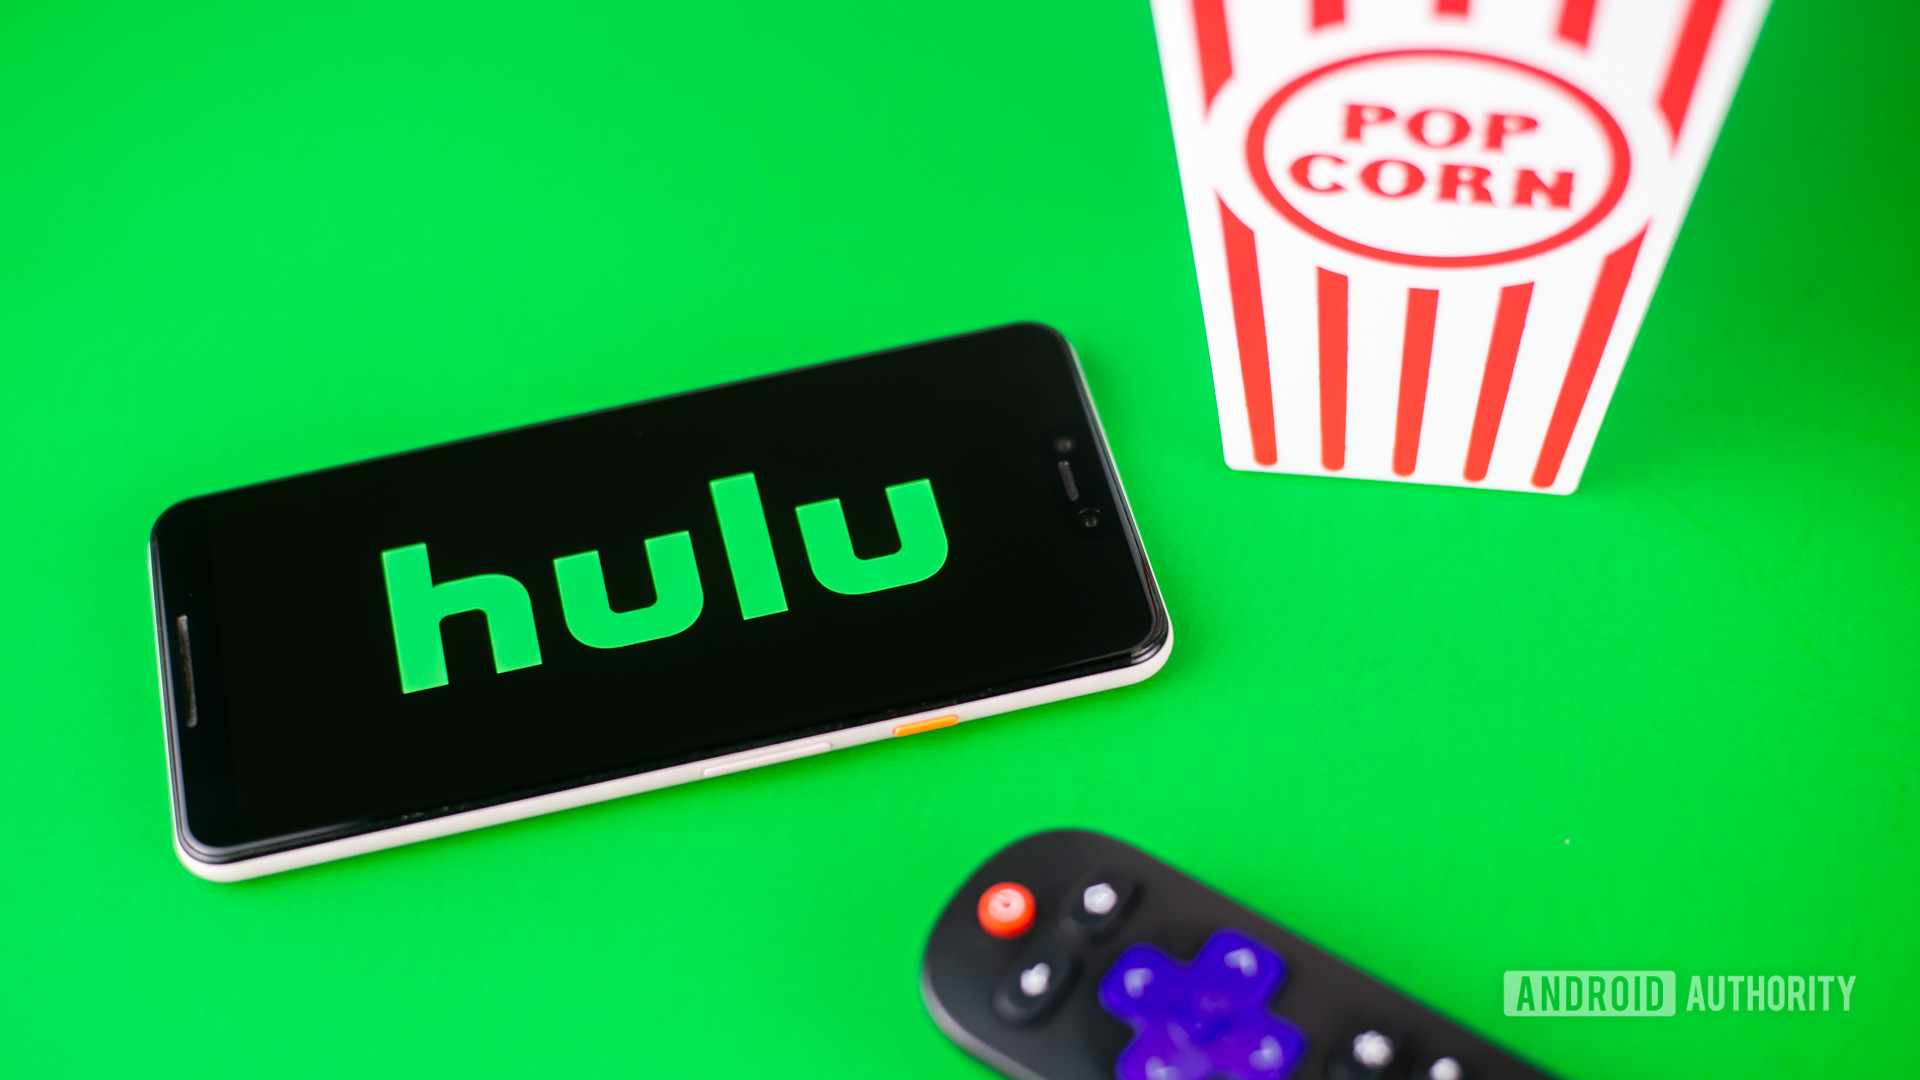 Hulu stock photo green background 2